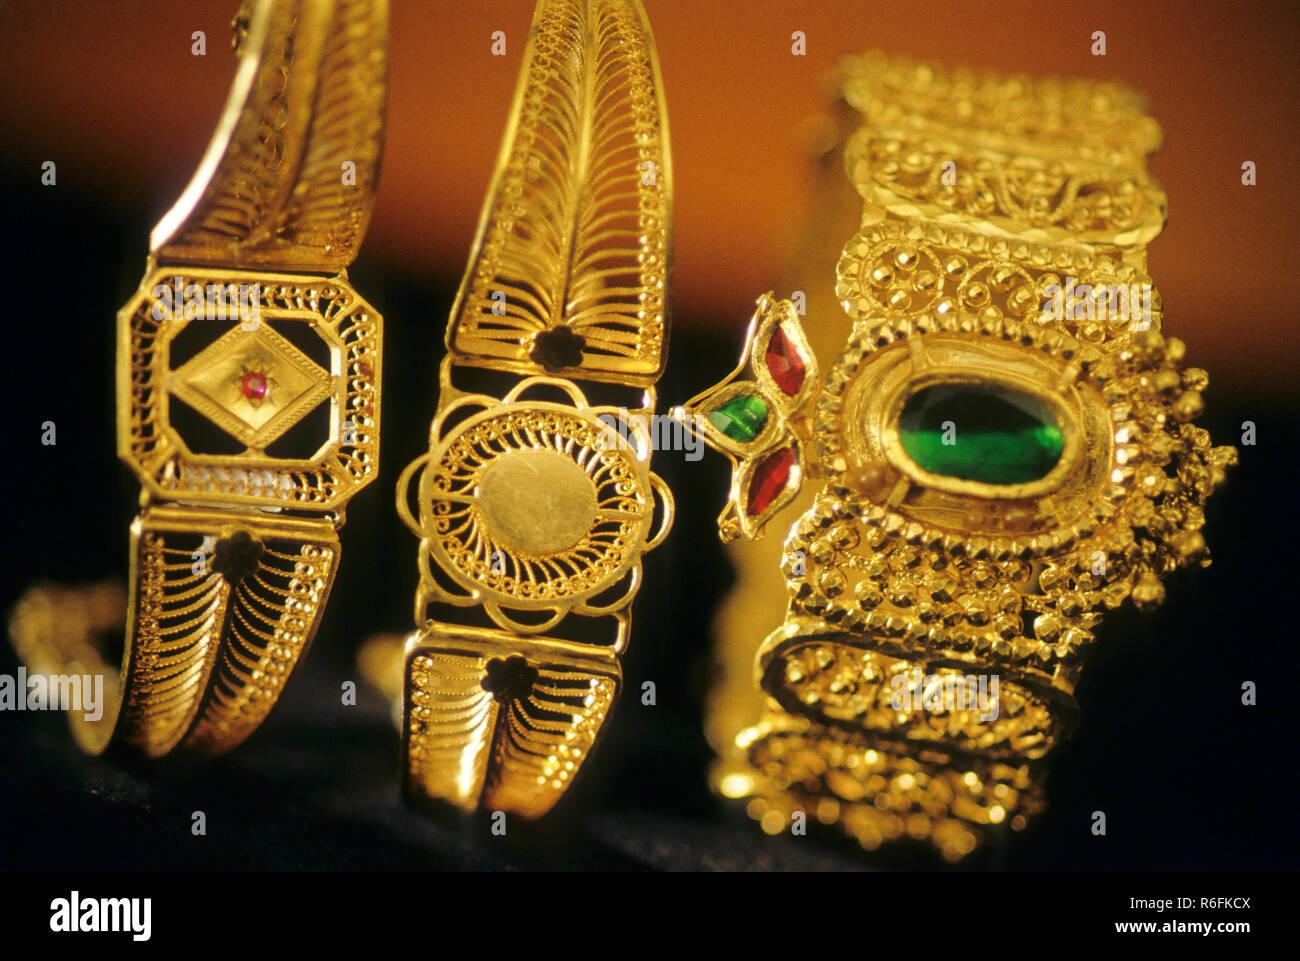 23 Carat Gold Jewelry Antique Jewelry, bangles - Stock Image